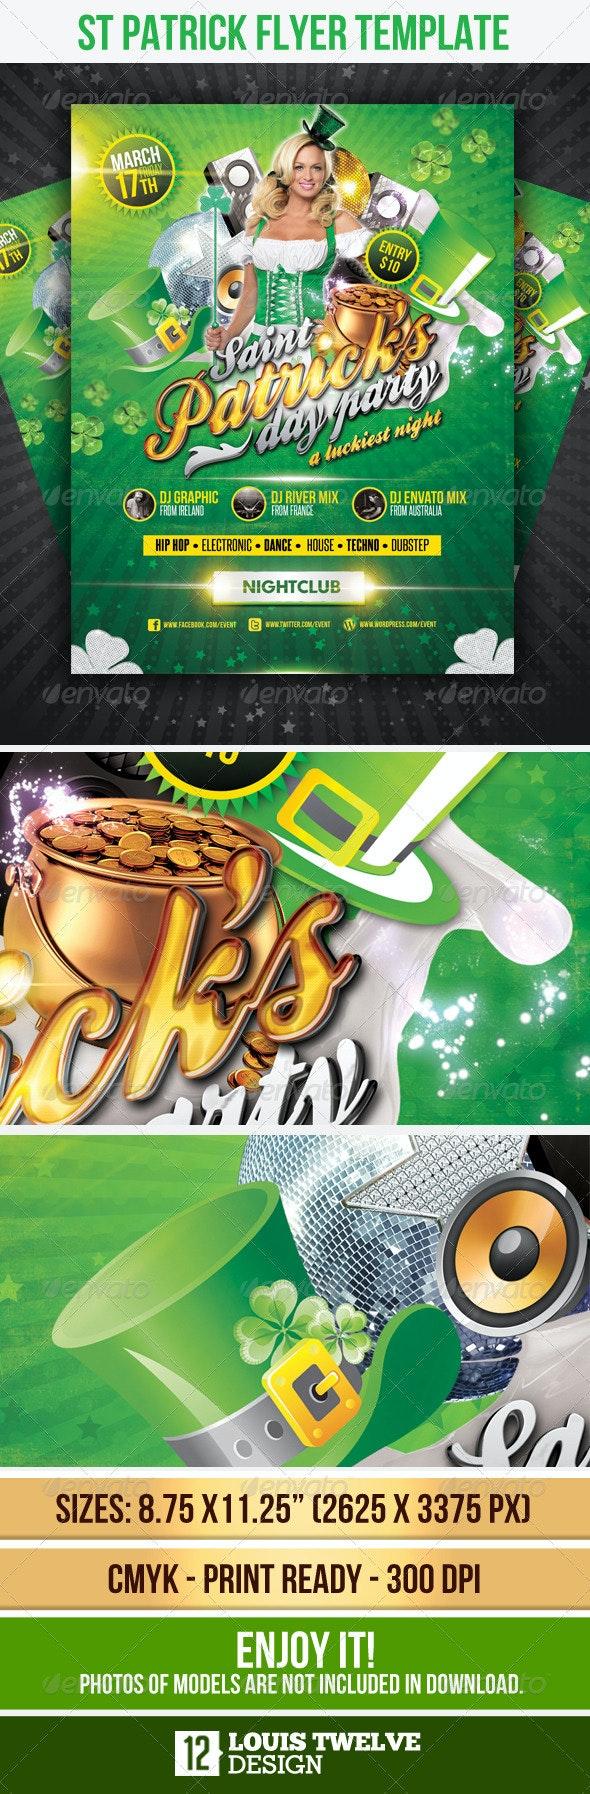 St Patricks Flyer Template - Flyers Print Templates